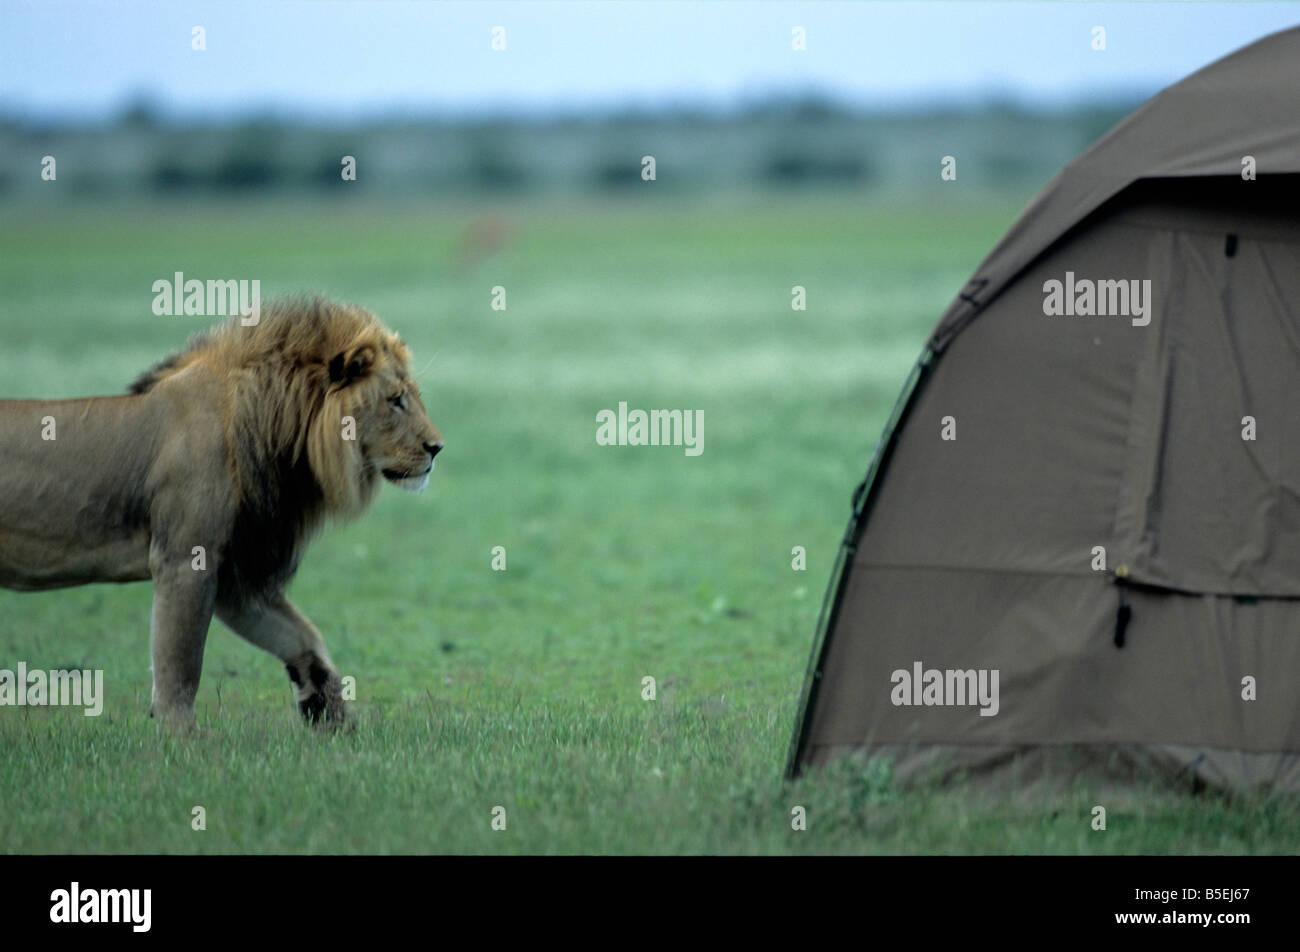 Lion, campers tent, Central Kalahari Game Reserve, Botswana, Africa - Stock Image